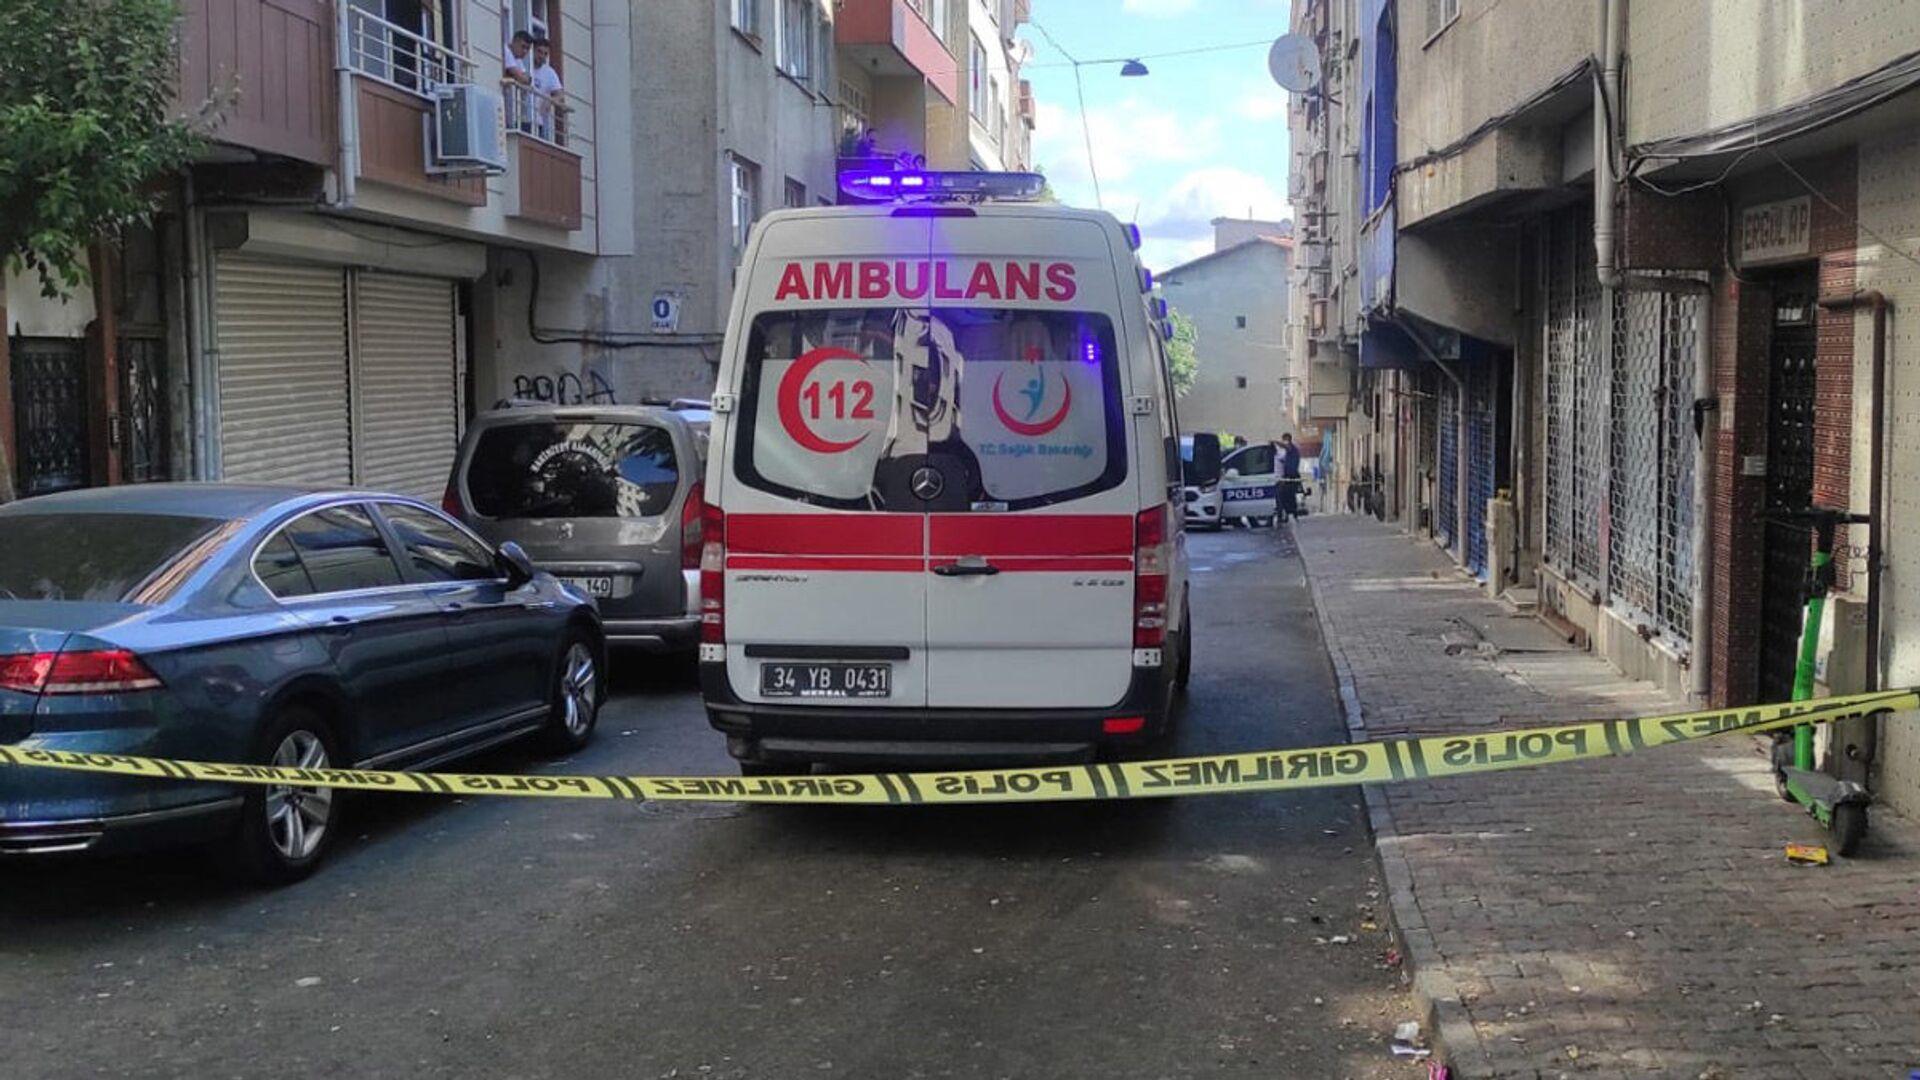 olay yeri - ambulans - Sputnik Türkiye, 1920, 27.07.2021